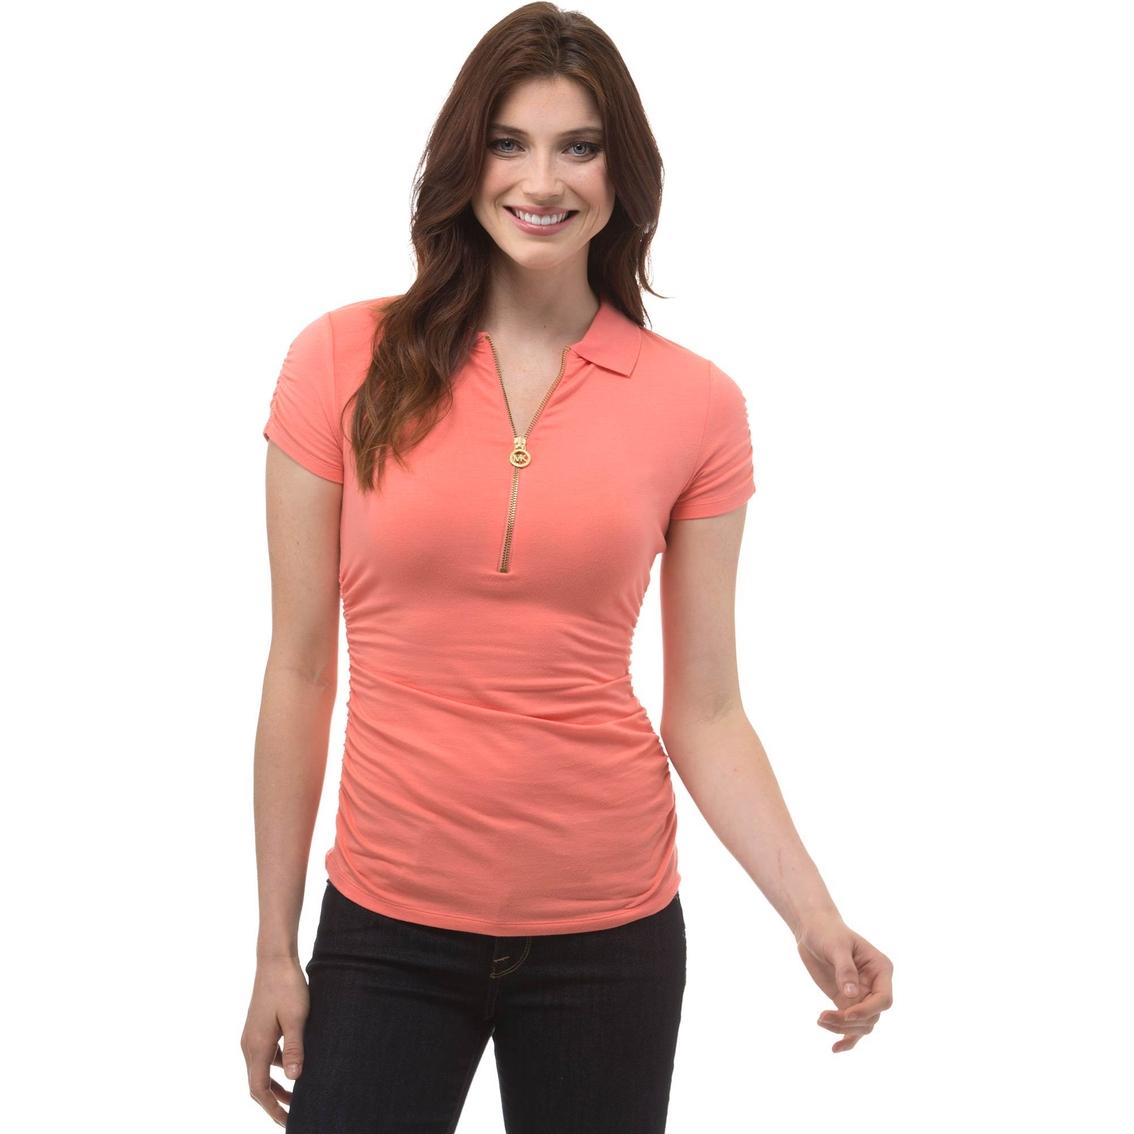 e88595a6 Michael Kors Zip Ruched Polo Shirt | Blouses & Tunics | Apparel ...